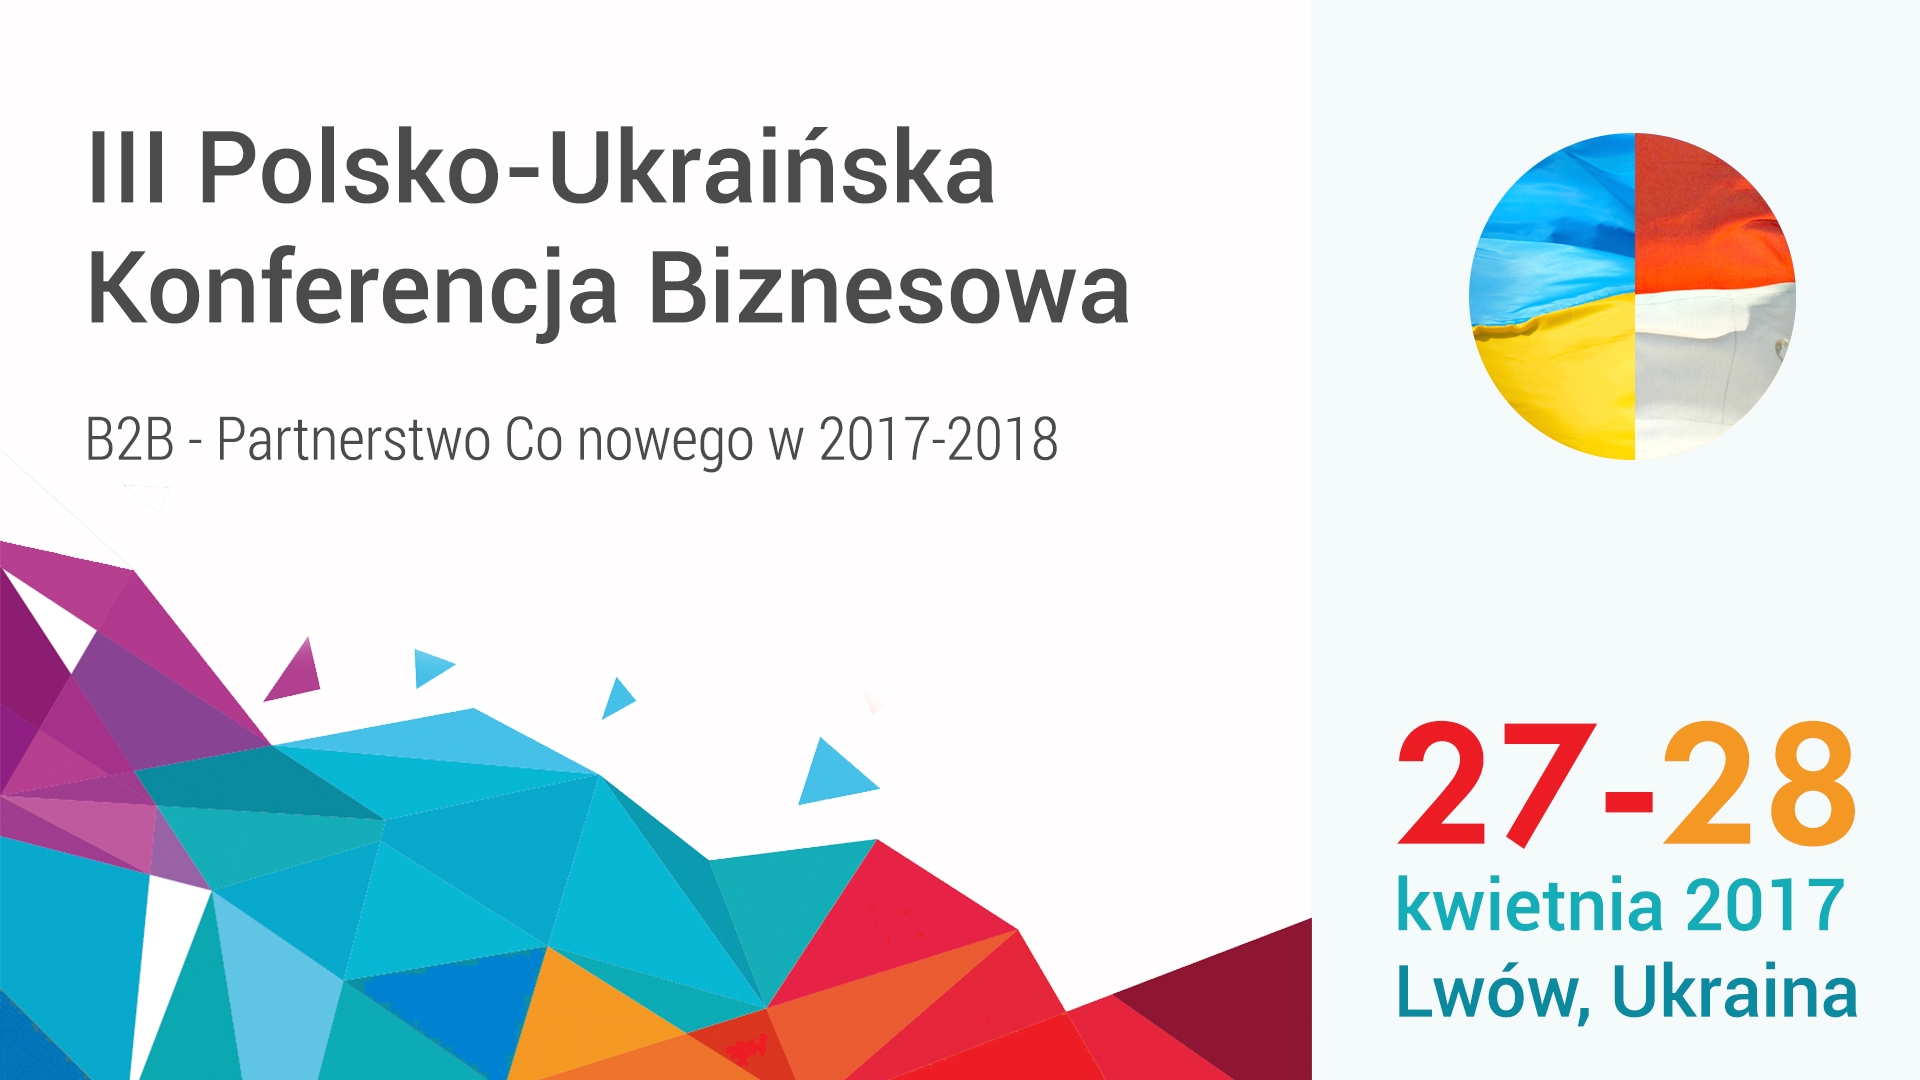 III Polsko-Ukraińska Konferencja Biznesowa pod patronatem BiznesAlert.pl